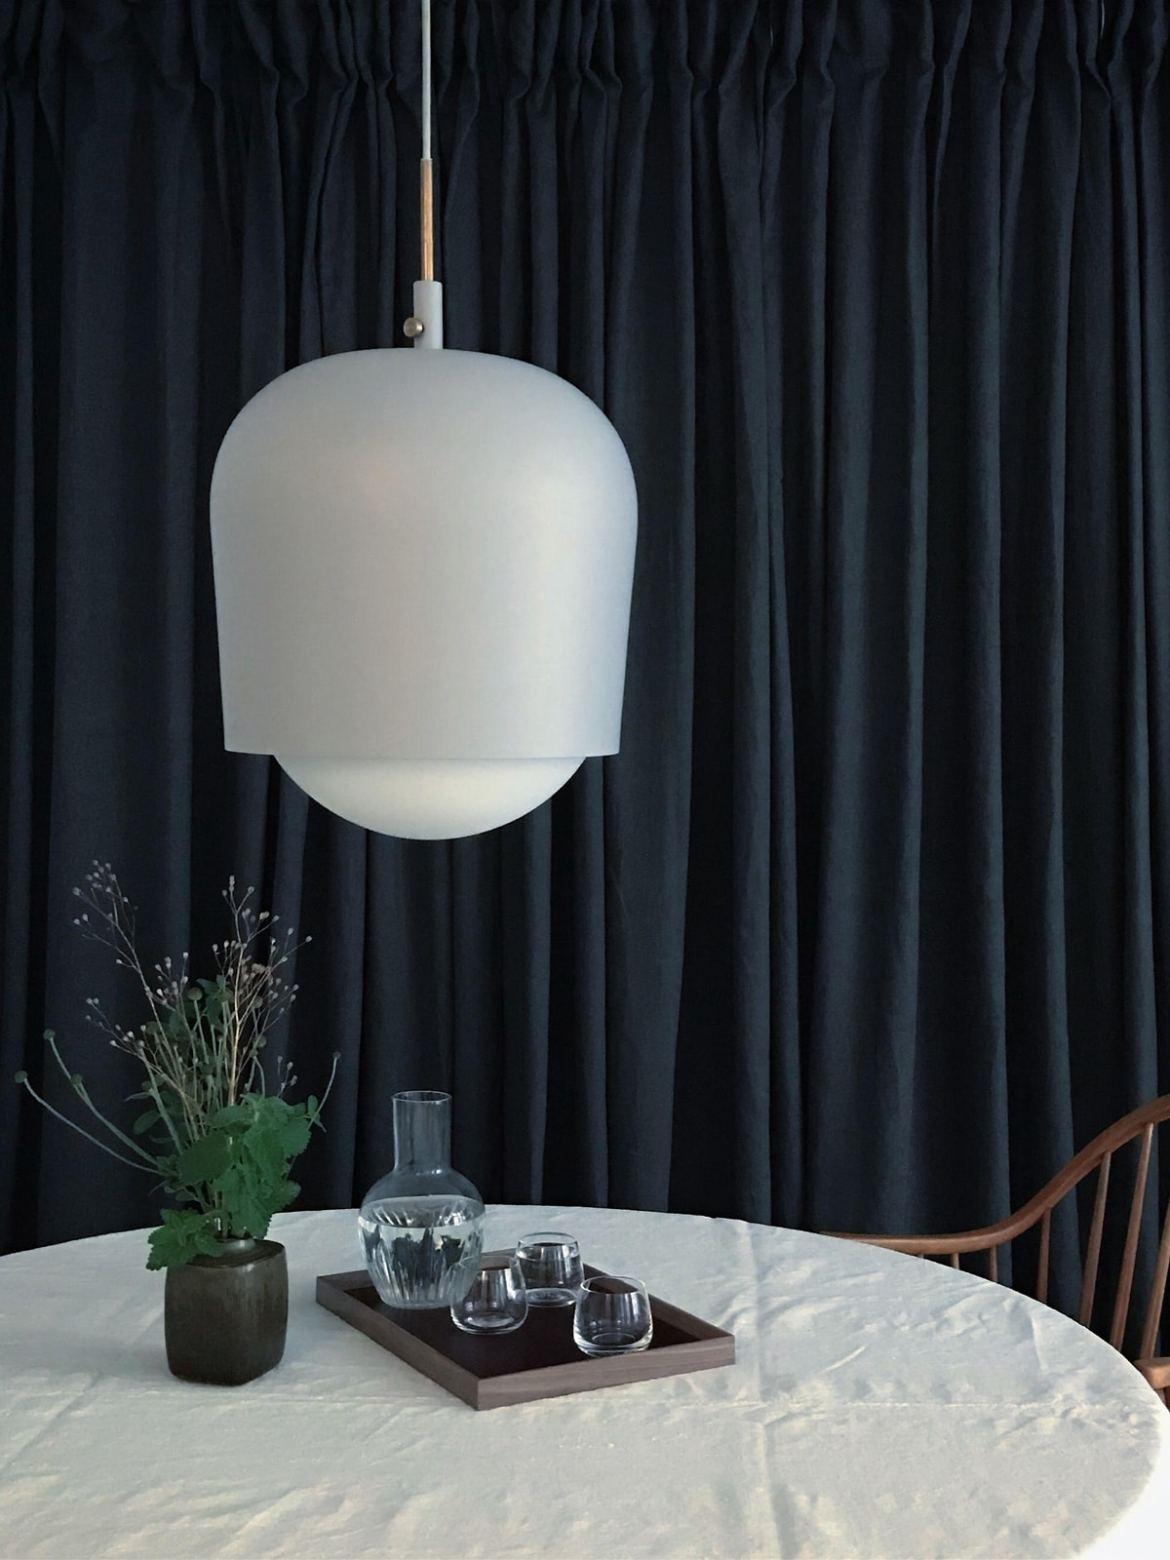 DesignOrt BLog: esstischleuchten Pendel Lampe Blind Lamp manuel dimmbar munk collective